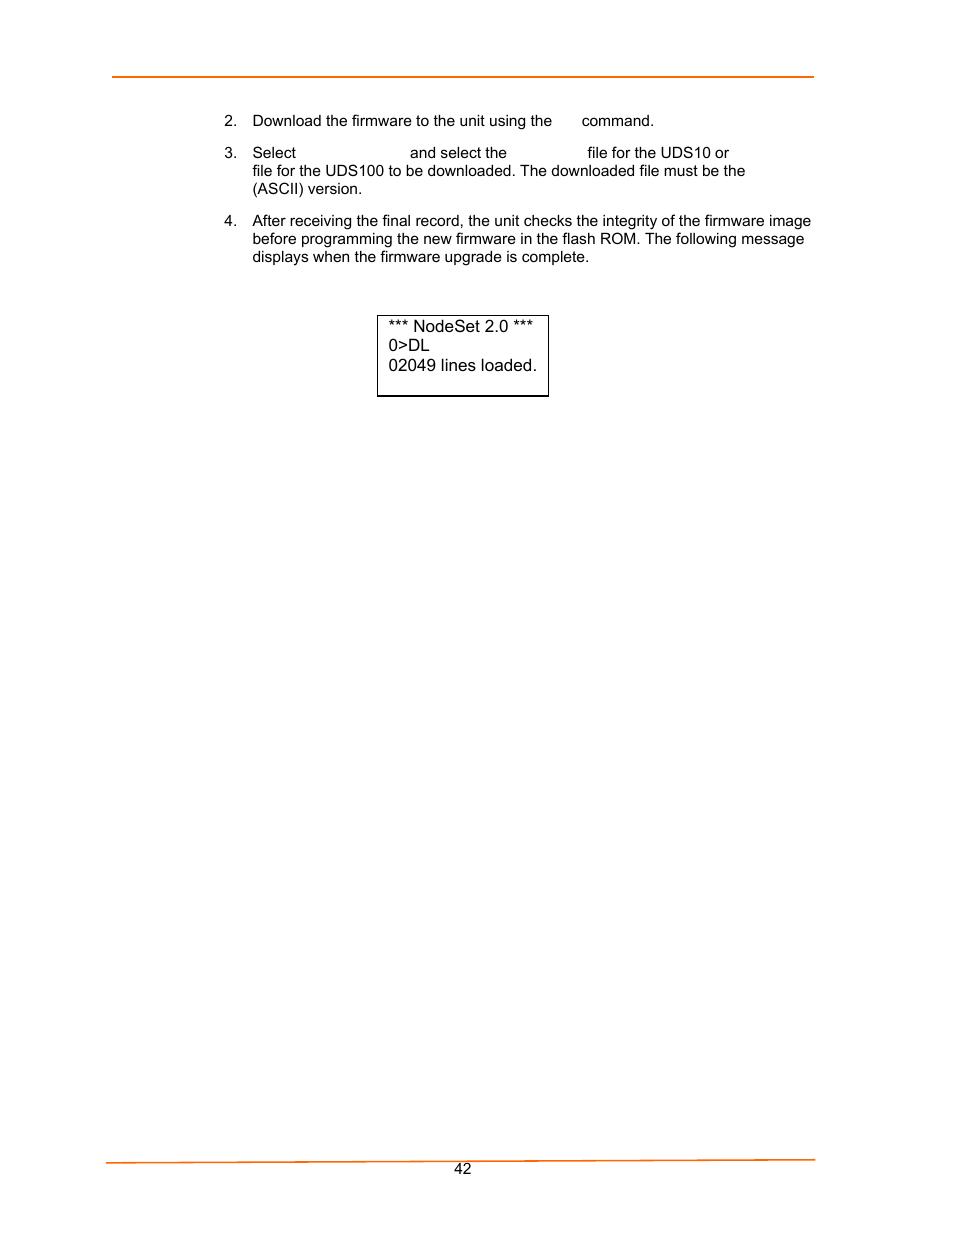 figure 6 3 firmware upgrade screen display lantronix uds100 user rh manualsdir com Example User Guide Clip Art User Guide